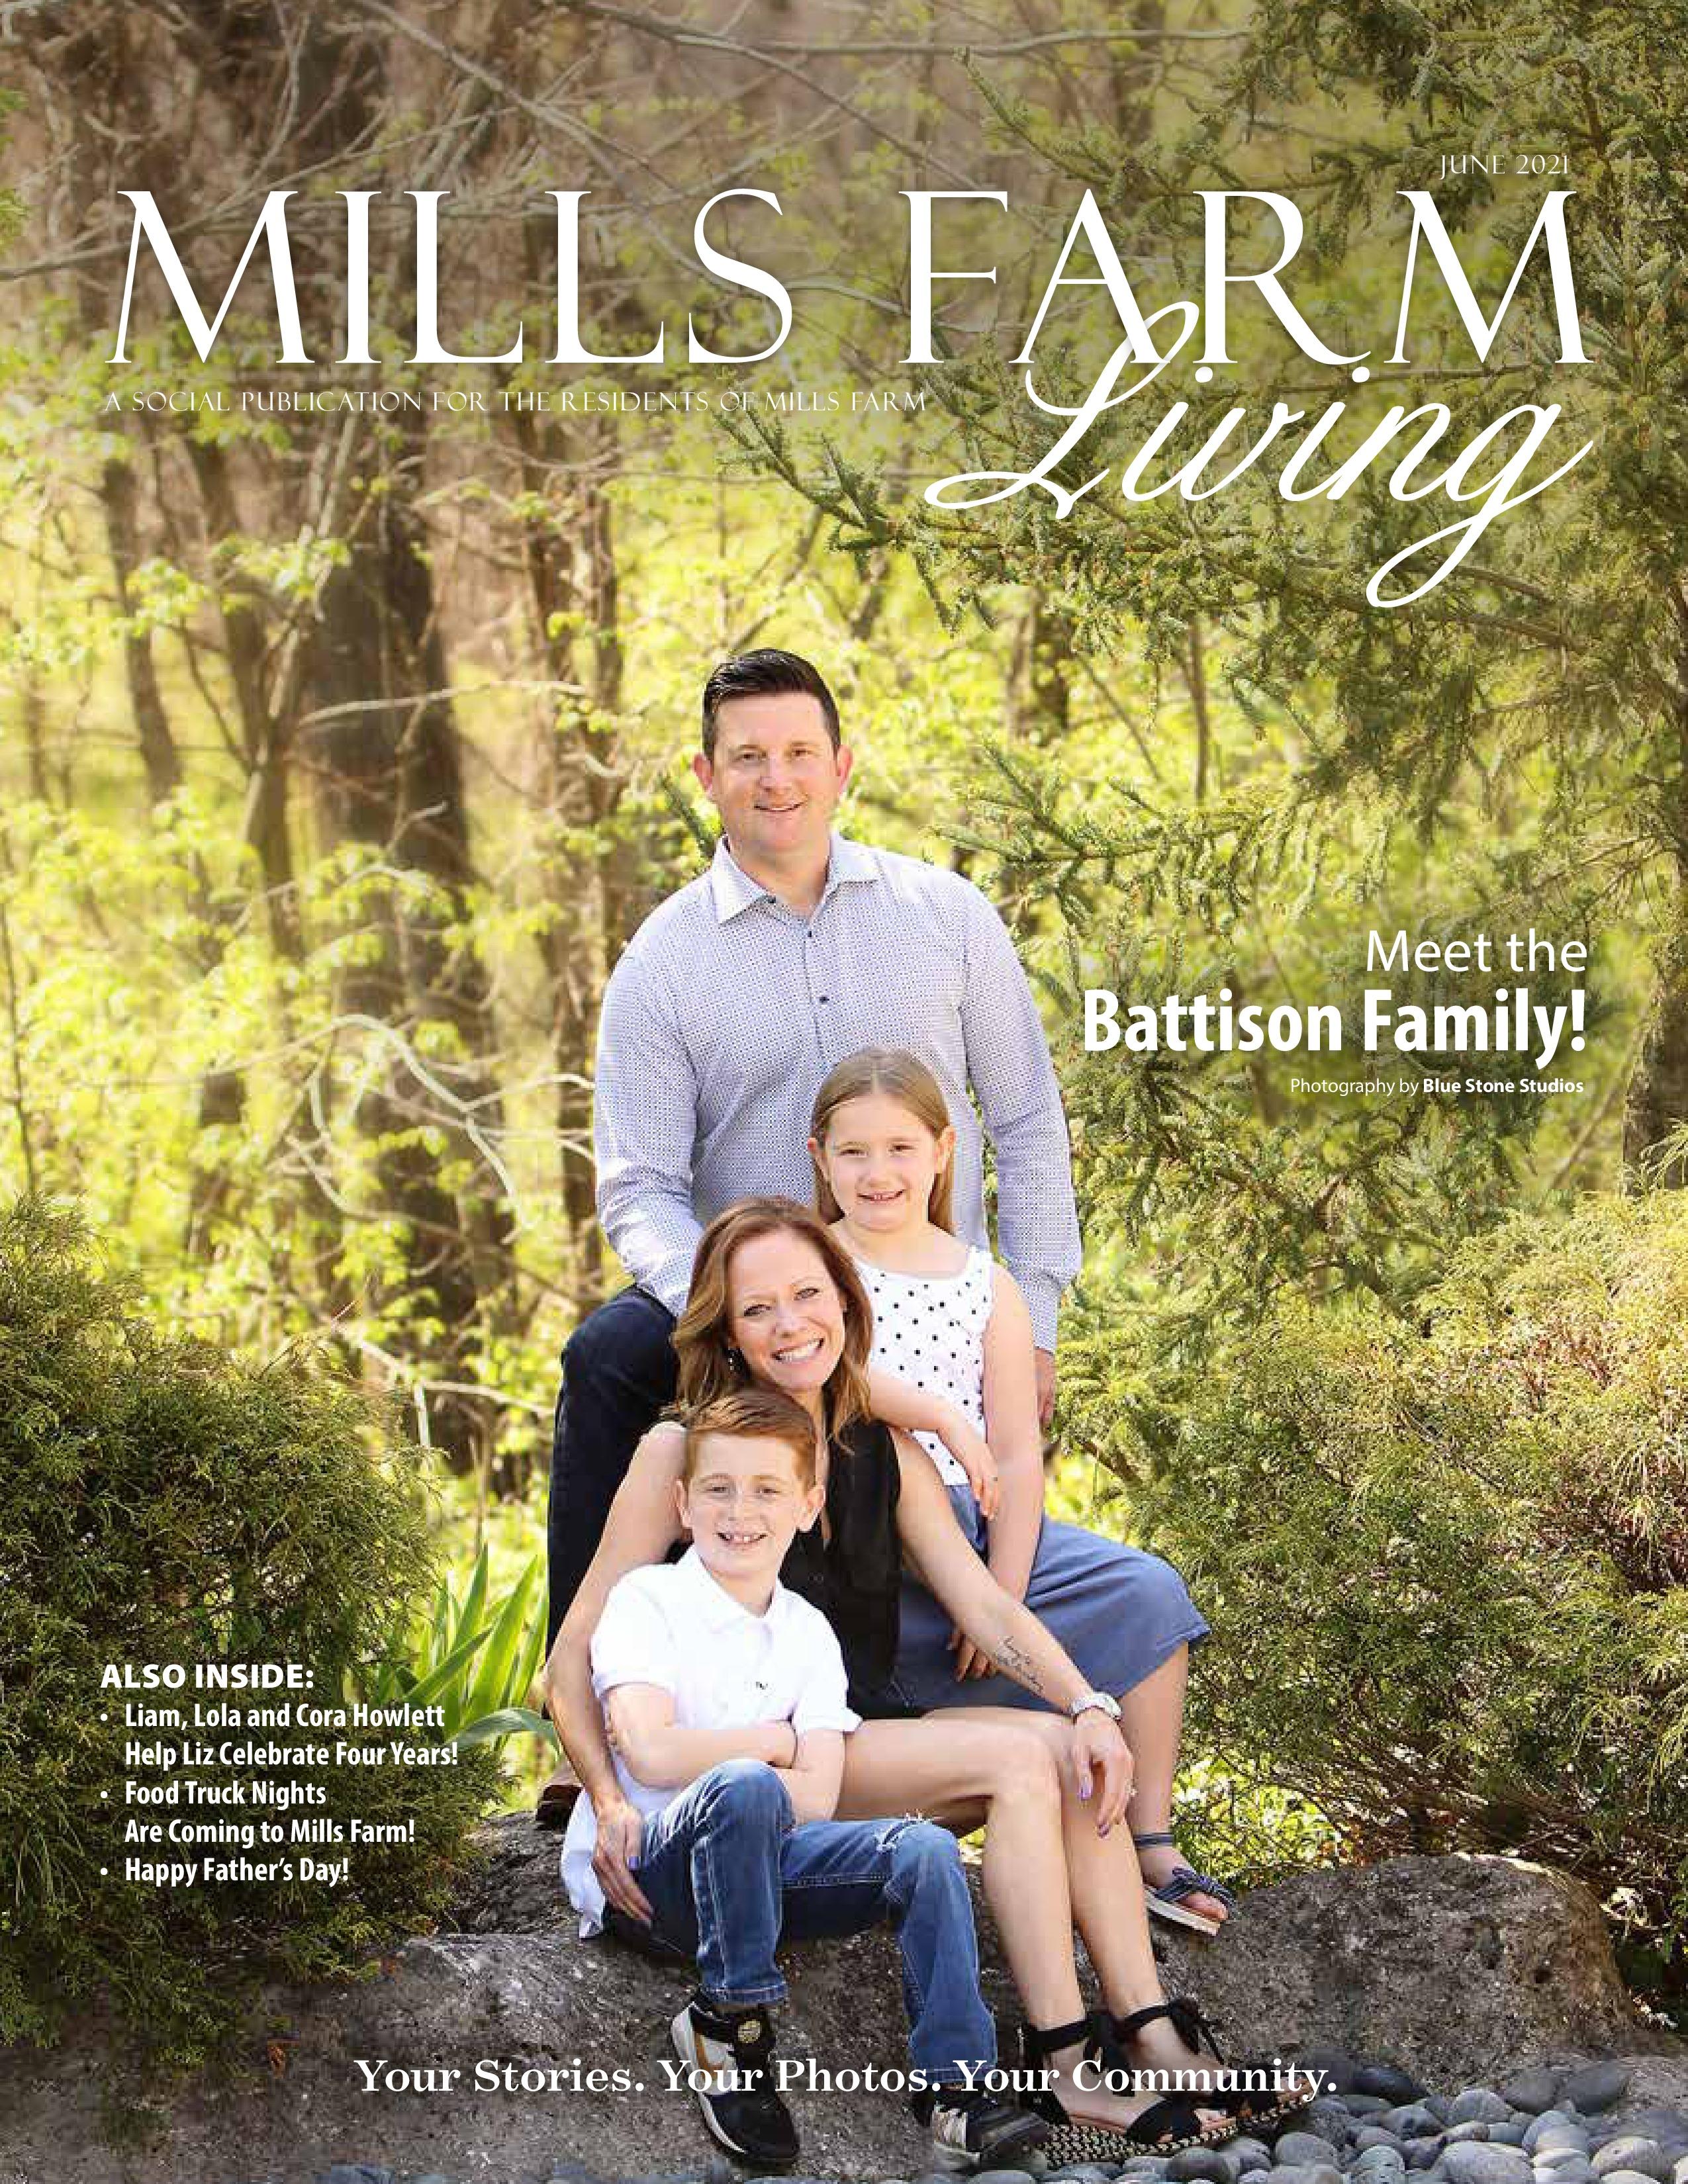 Mills Farm Living 2021-06-01